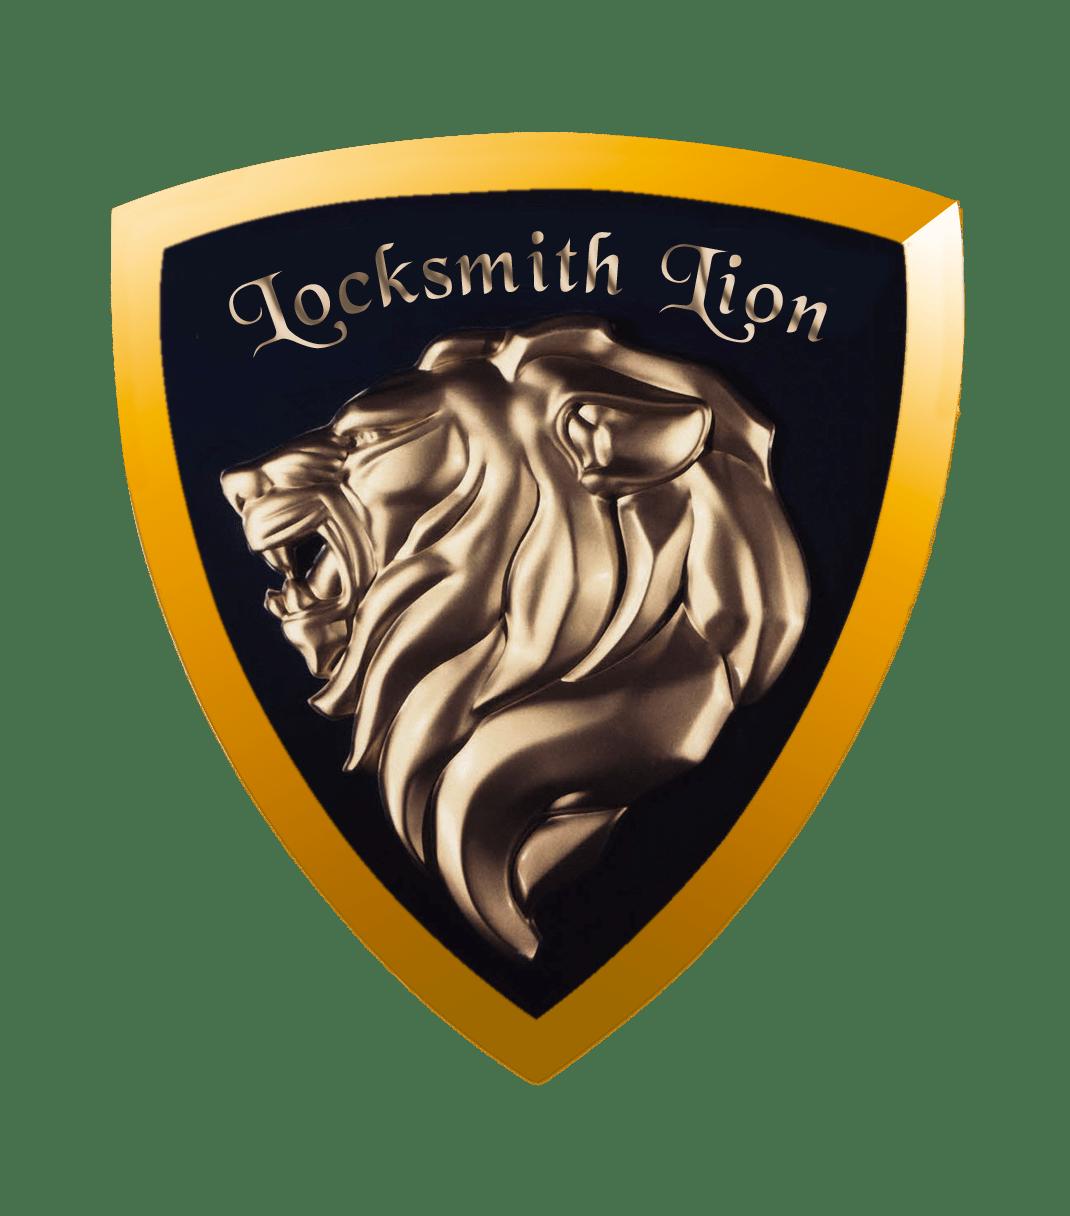 Cary locksmith lion   logo 24 hour car locksmiths cary nc locksmith min copy